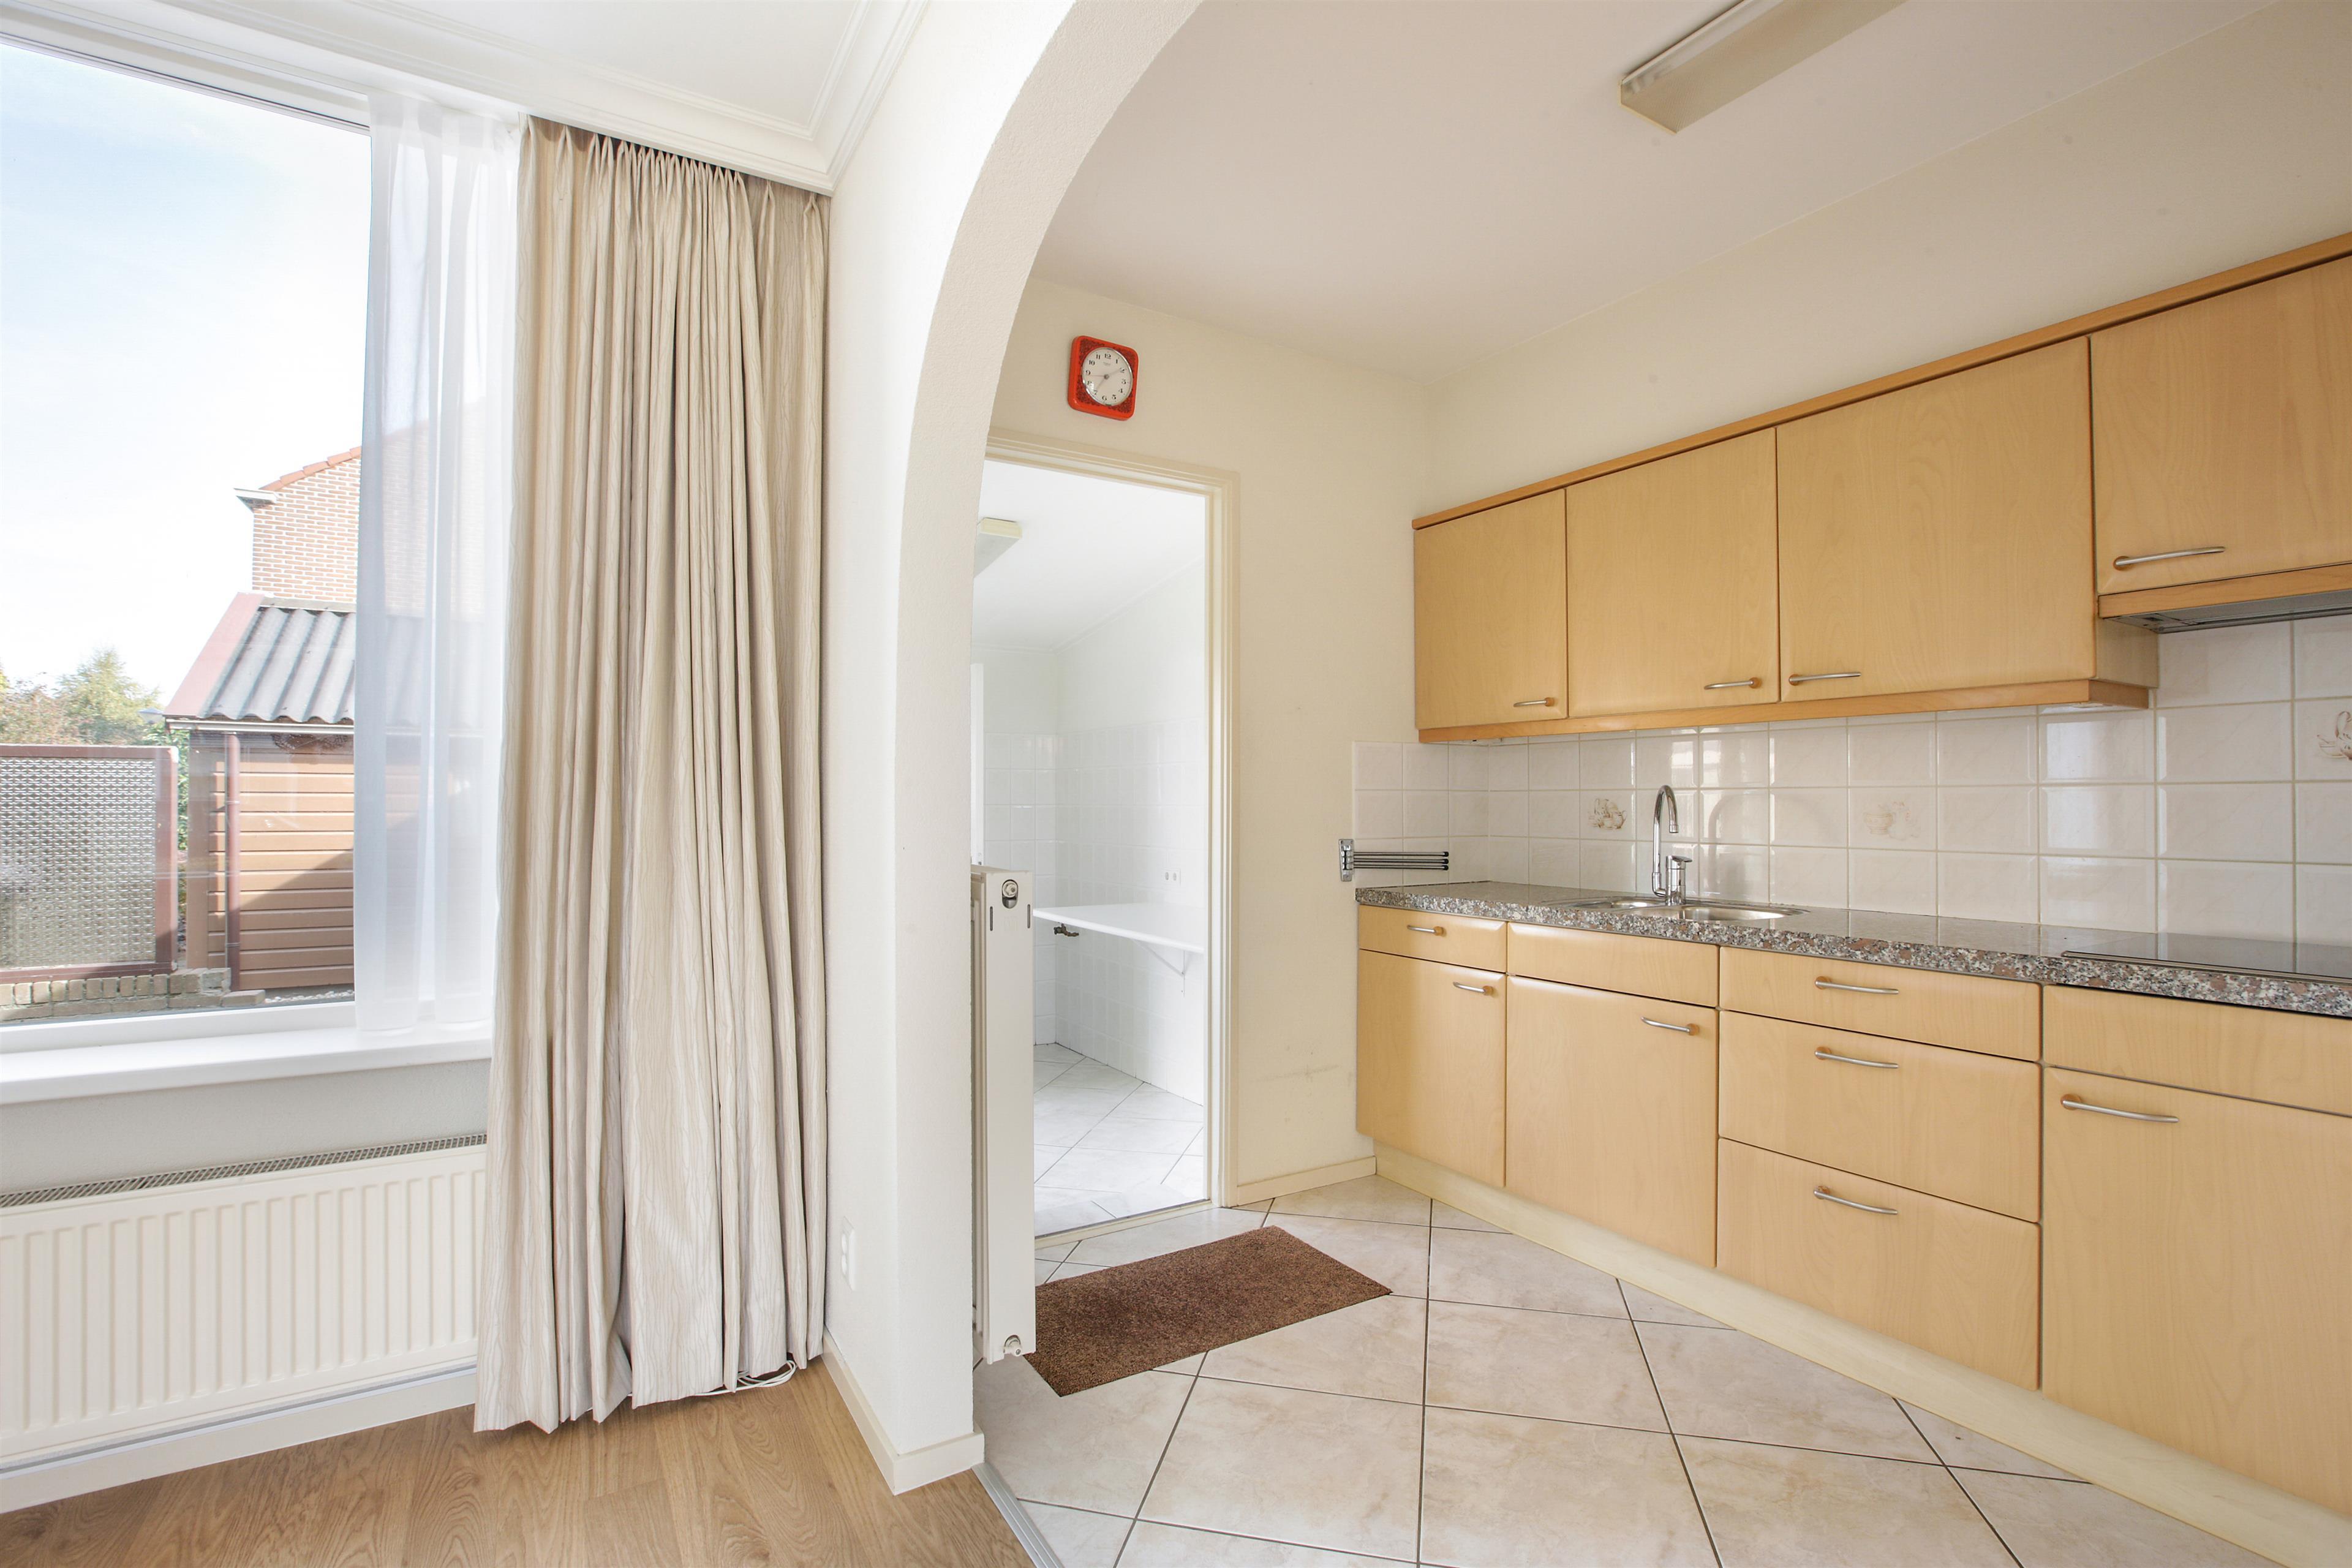 Badkamer Accessoires Blokker : Te koop: wagenaarstraat 15 blokker hoekstra en van eck